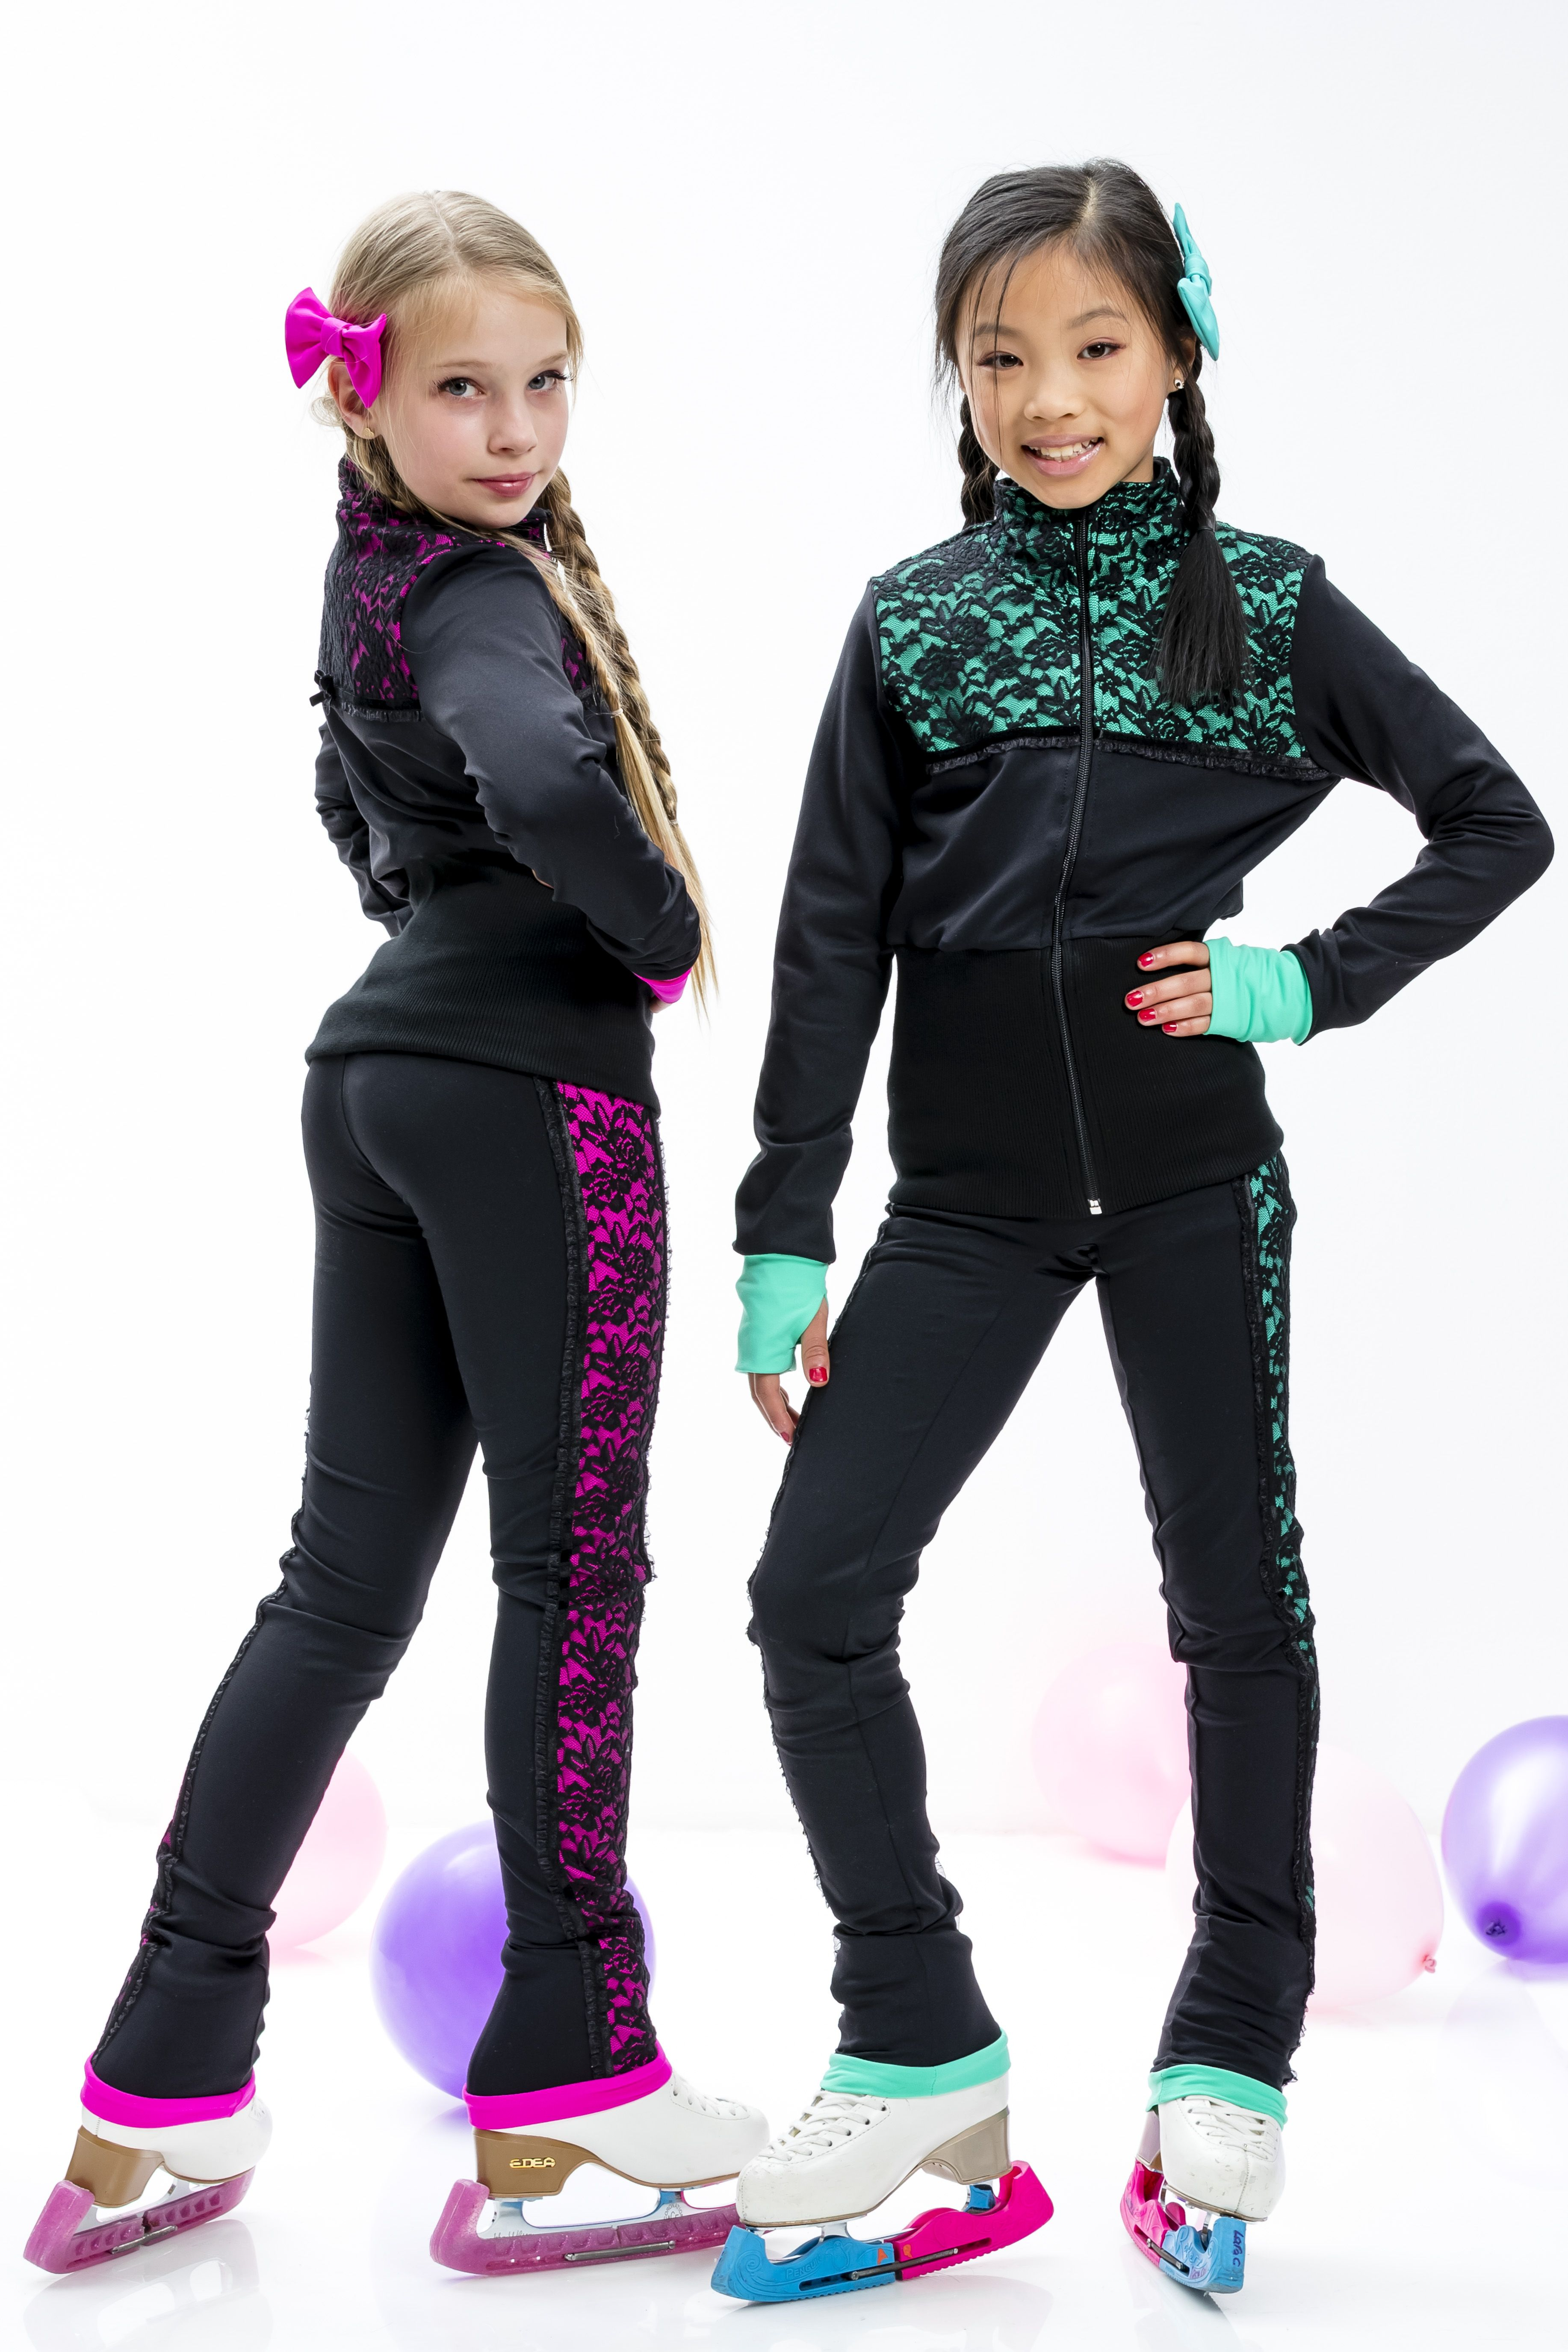 ny2 Sportswear Figure Skating Polar Fleece Fitted Jackets by Polartec P02